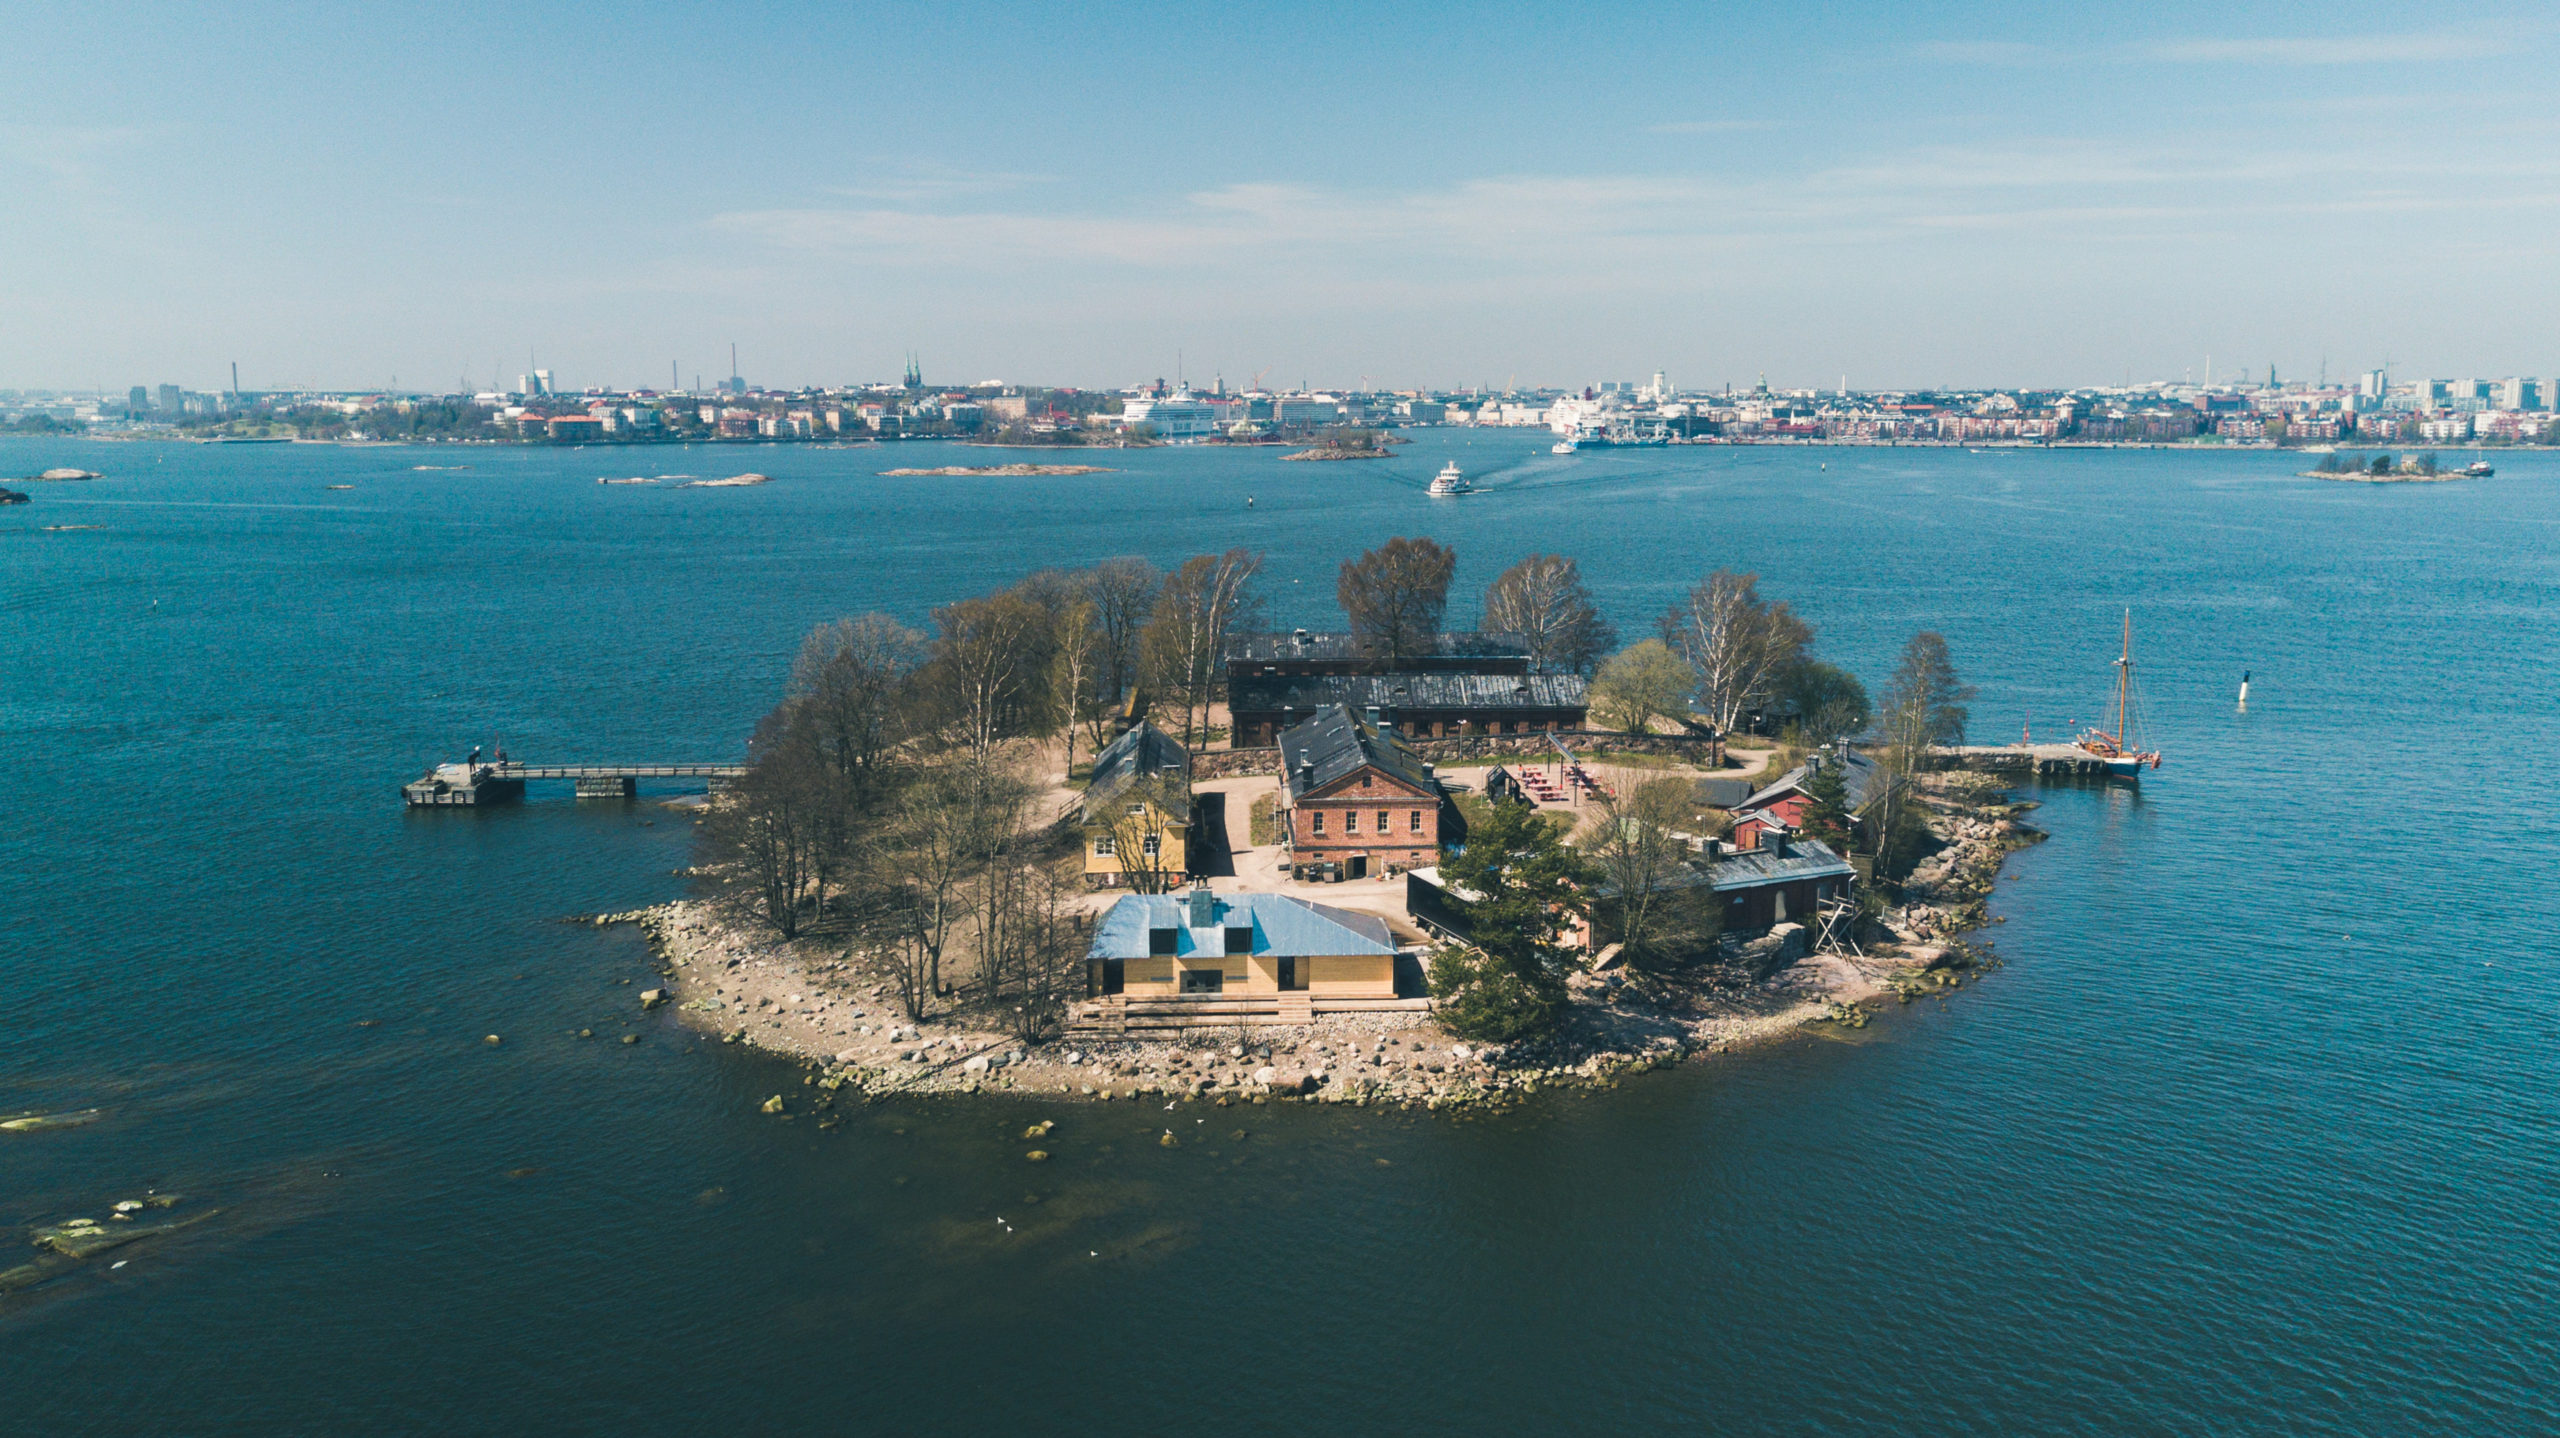 Lonna © Tommi Kortesniemi, My Helsinki